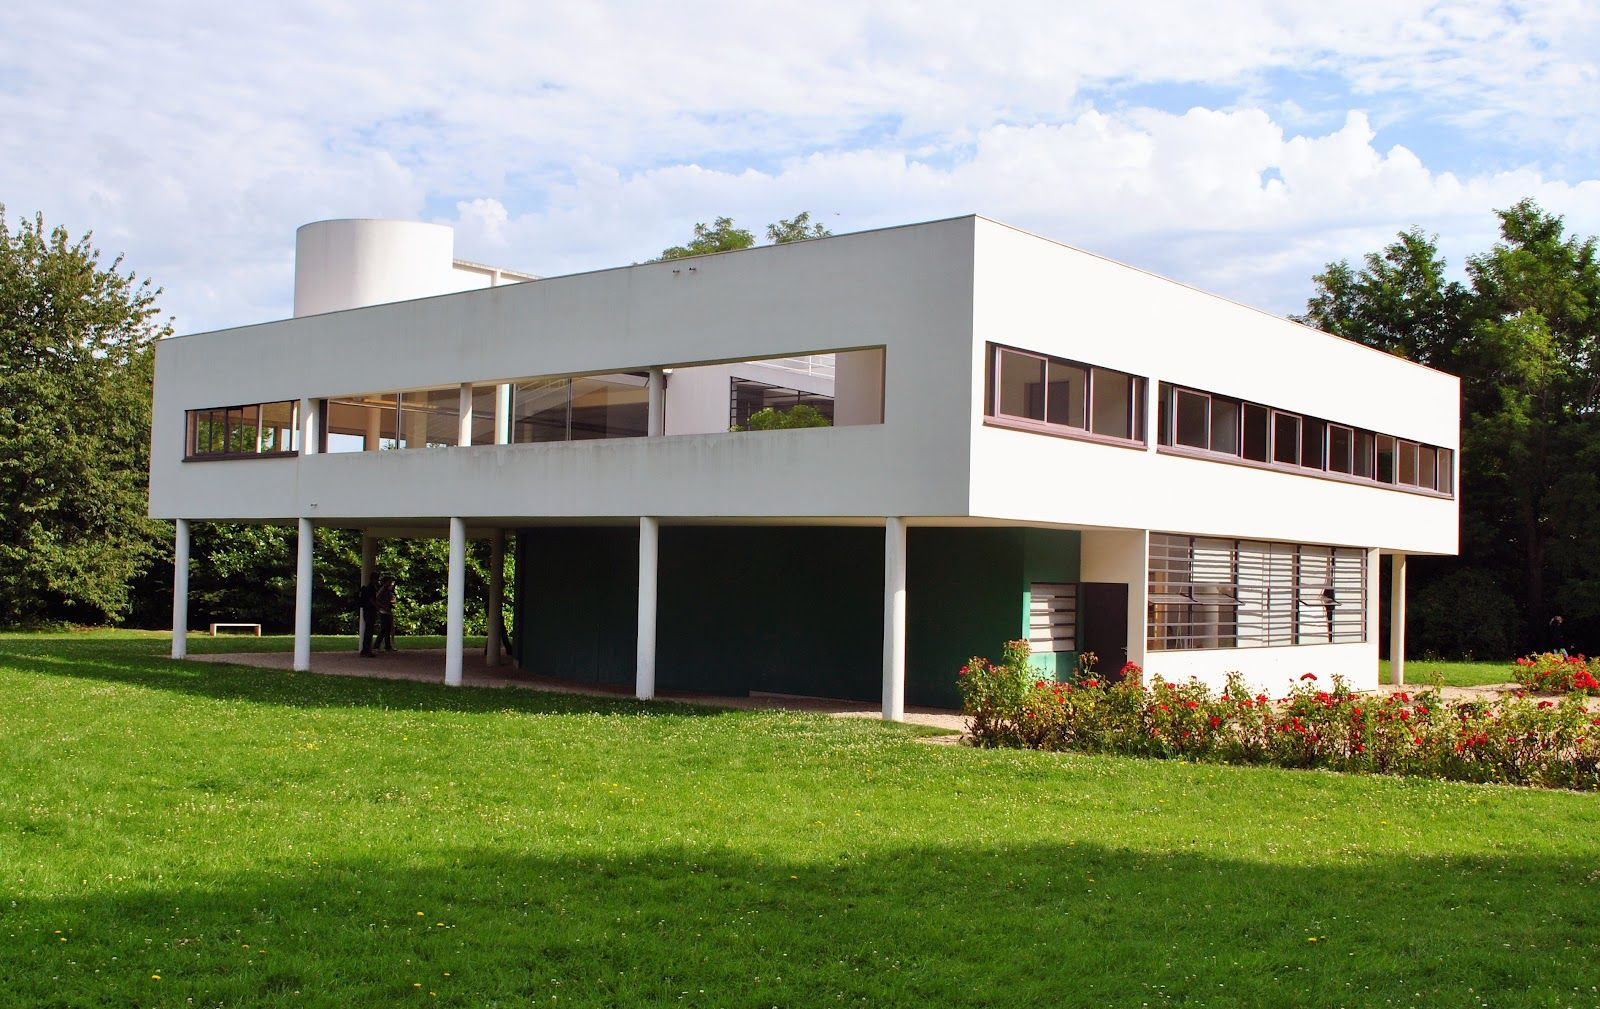 Villa savoye le corbusier pinterest le corbusier villas and pierre jea - Le corbusier villa savoye ...